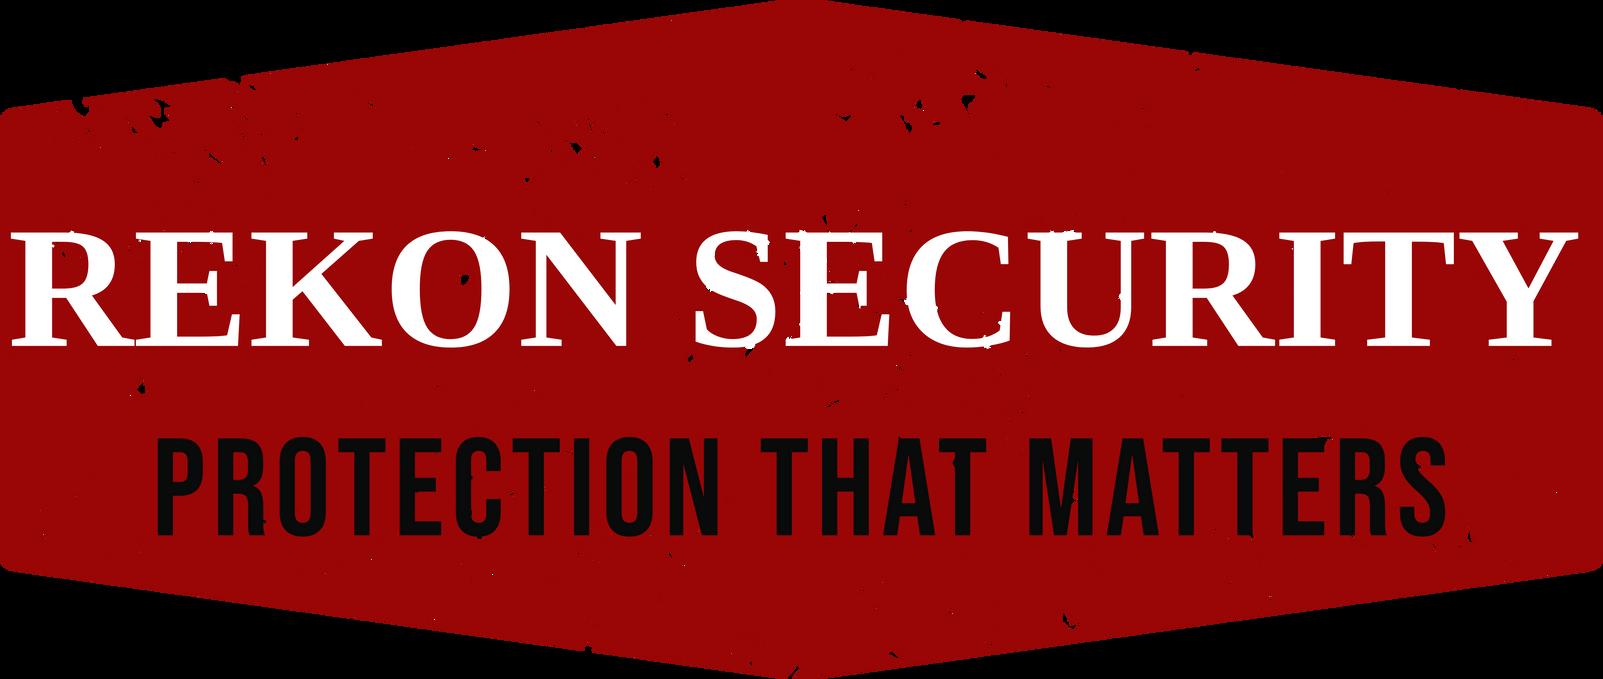 Rekon Security